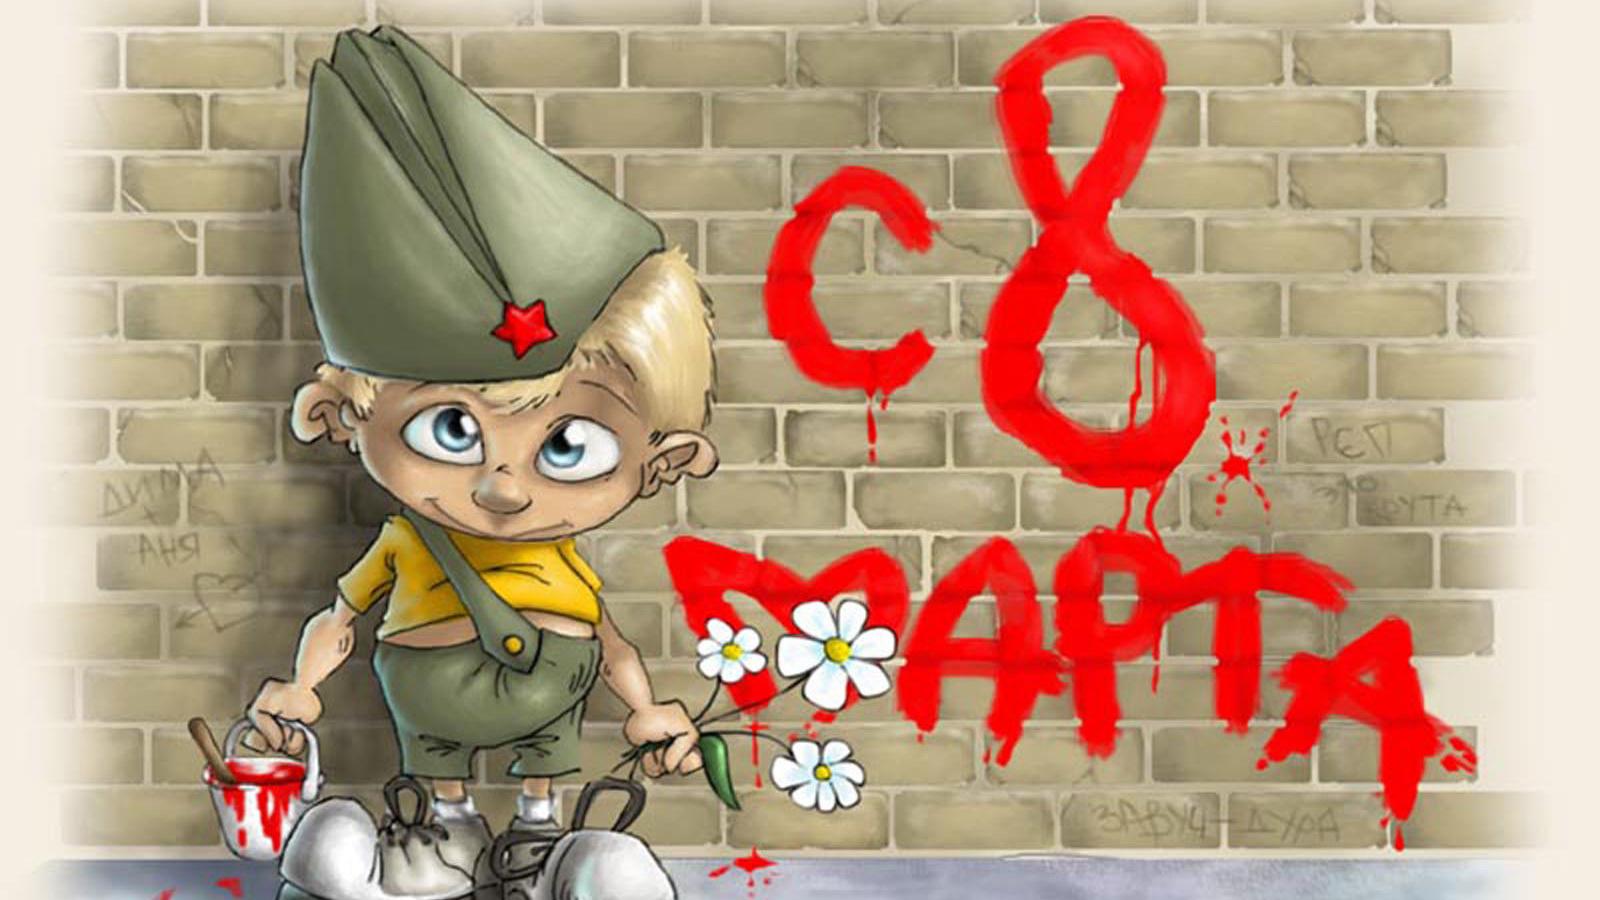 http://desktopwallpapers.org.ua/download.php?img=201303/1600x900/desktopwallpapers.org.ua-25392.jpg